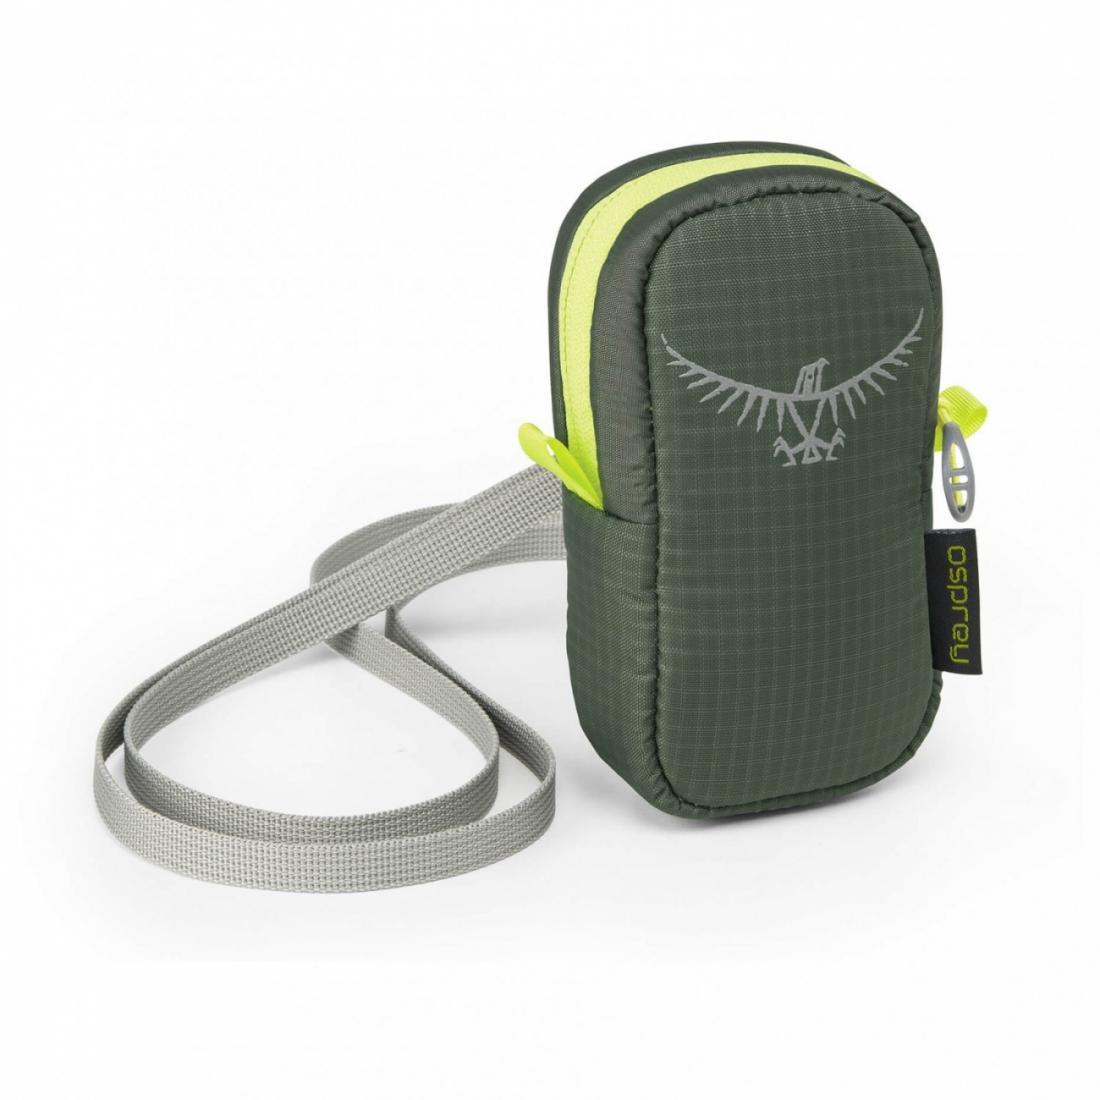 Чехол для камеры Ultralight Camera CaseАксессуары<br><br><br>Цвет: Светло-зеленый<br>Размер: S